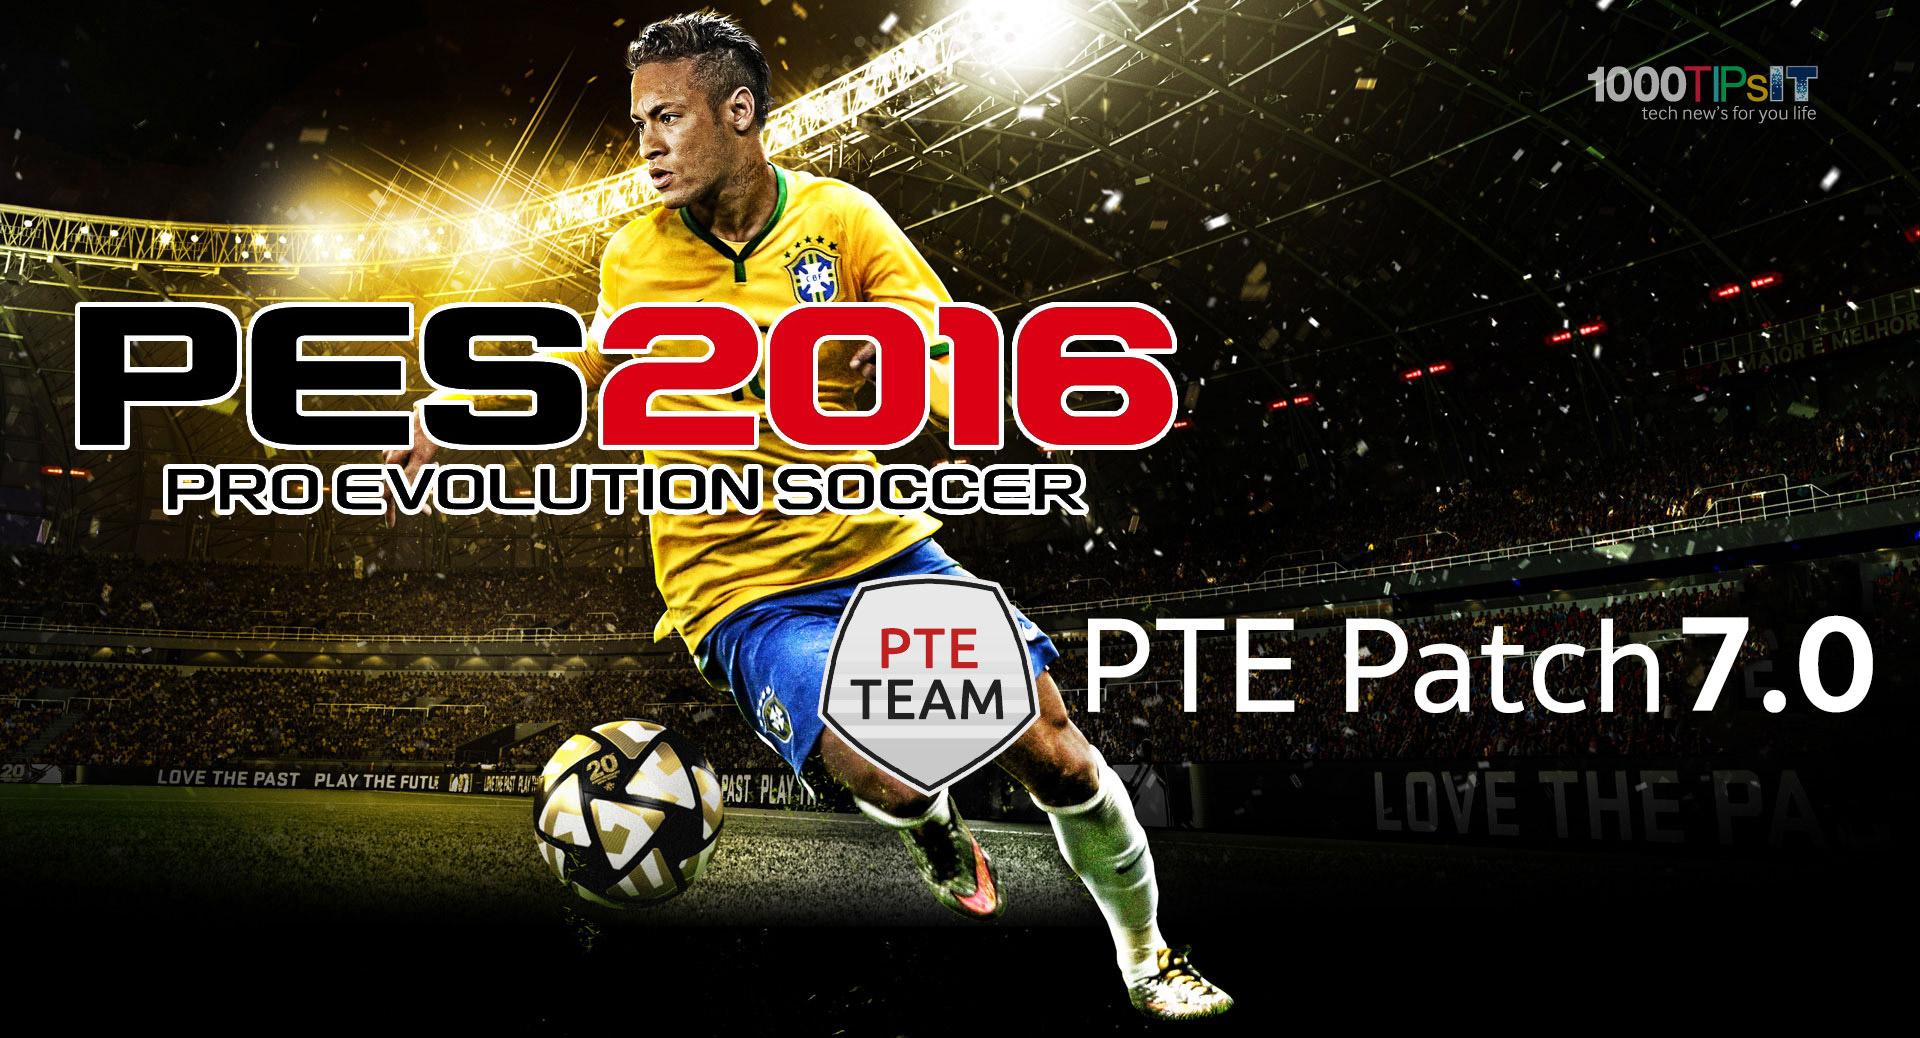 PTE Patch 7 0 สำหรับ PES 2016 ออกแล้ว ดาวน์โหลดได้ที่นี่